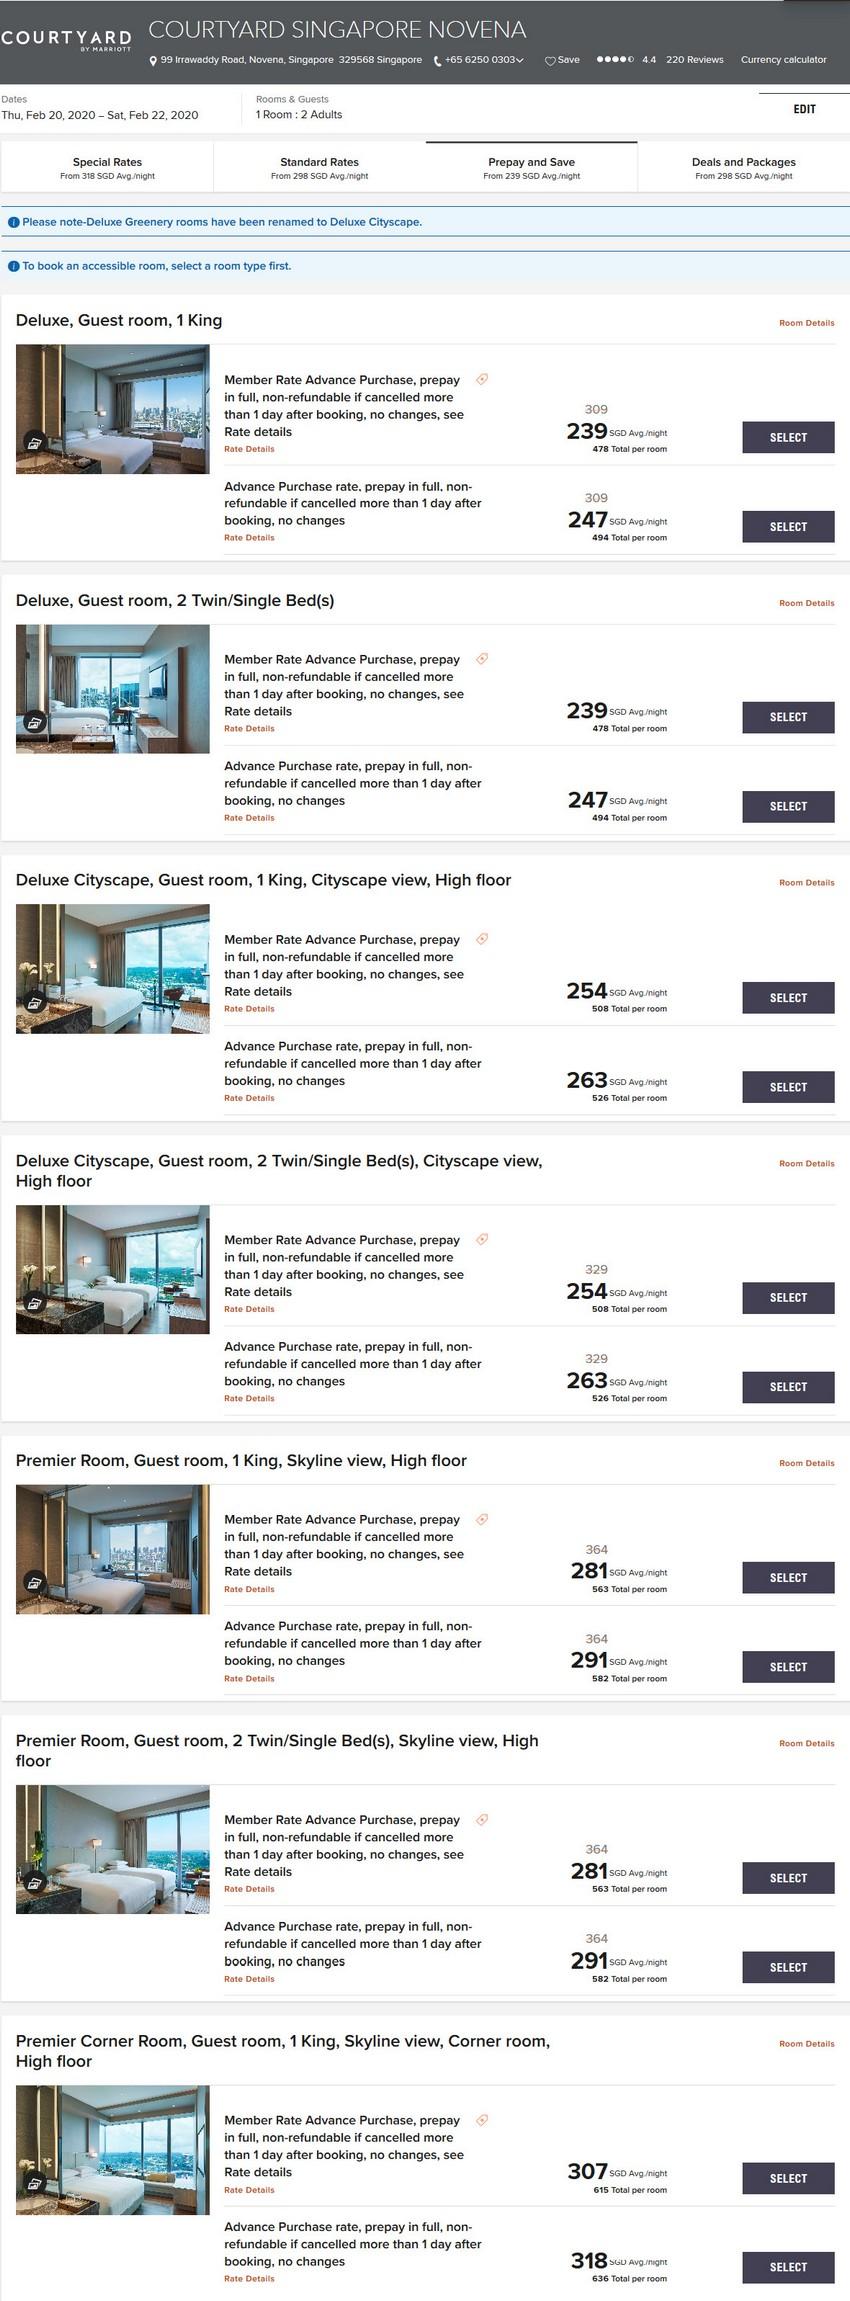 Vergleich Marriott Bonvoy Epic Stay Raten Courtyard Singapore Novena